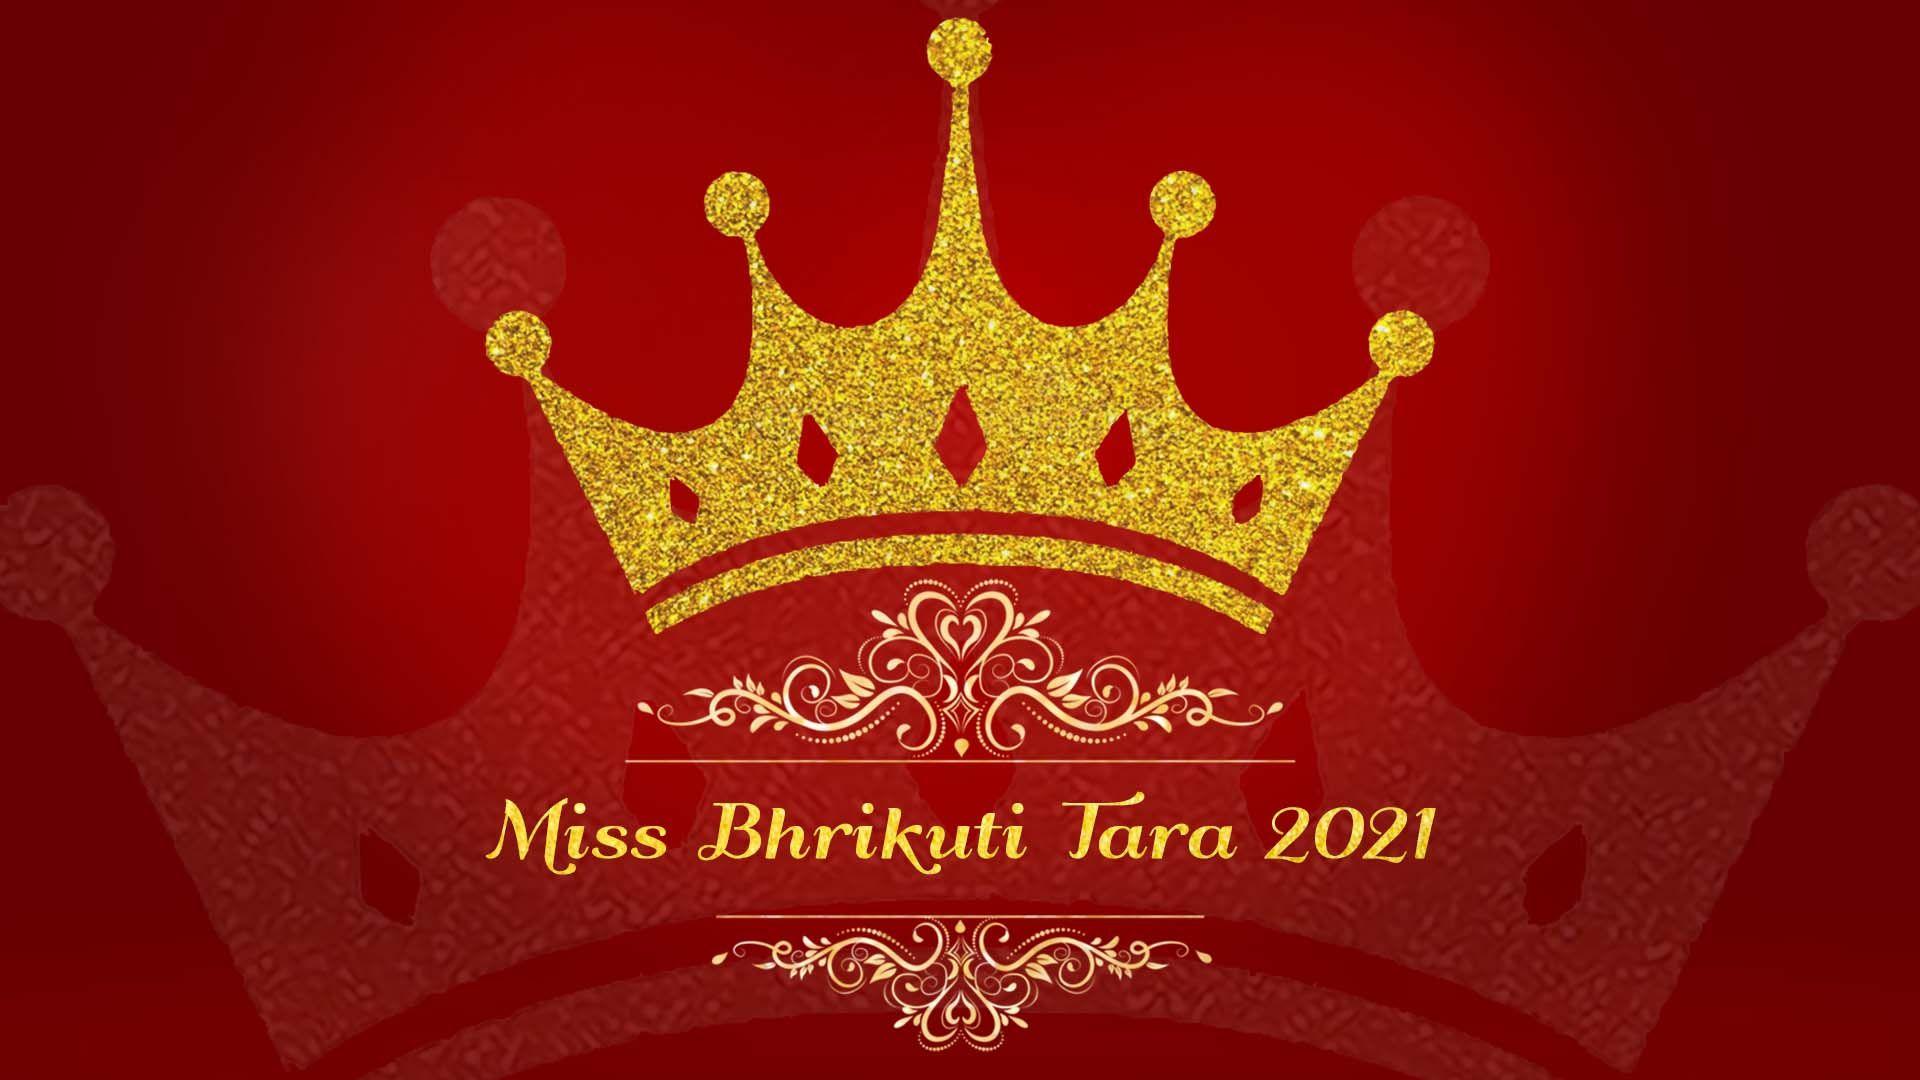 Miss Bhrikuti Tara 2021